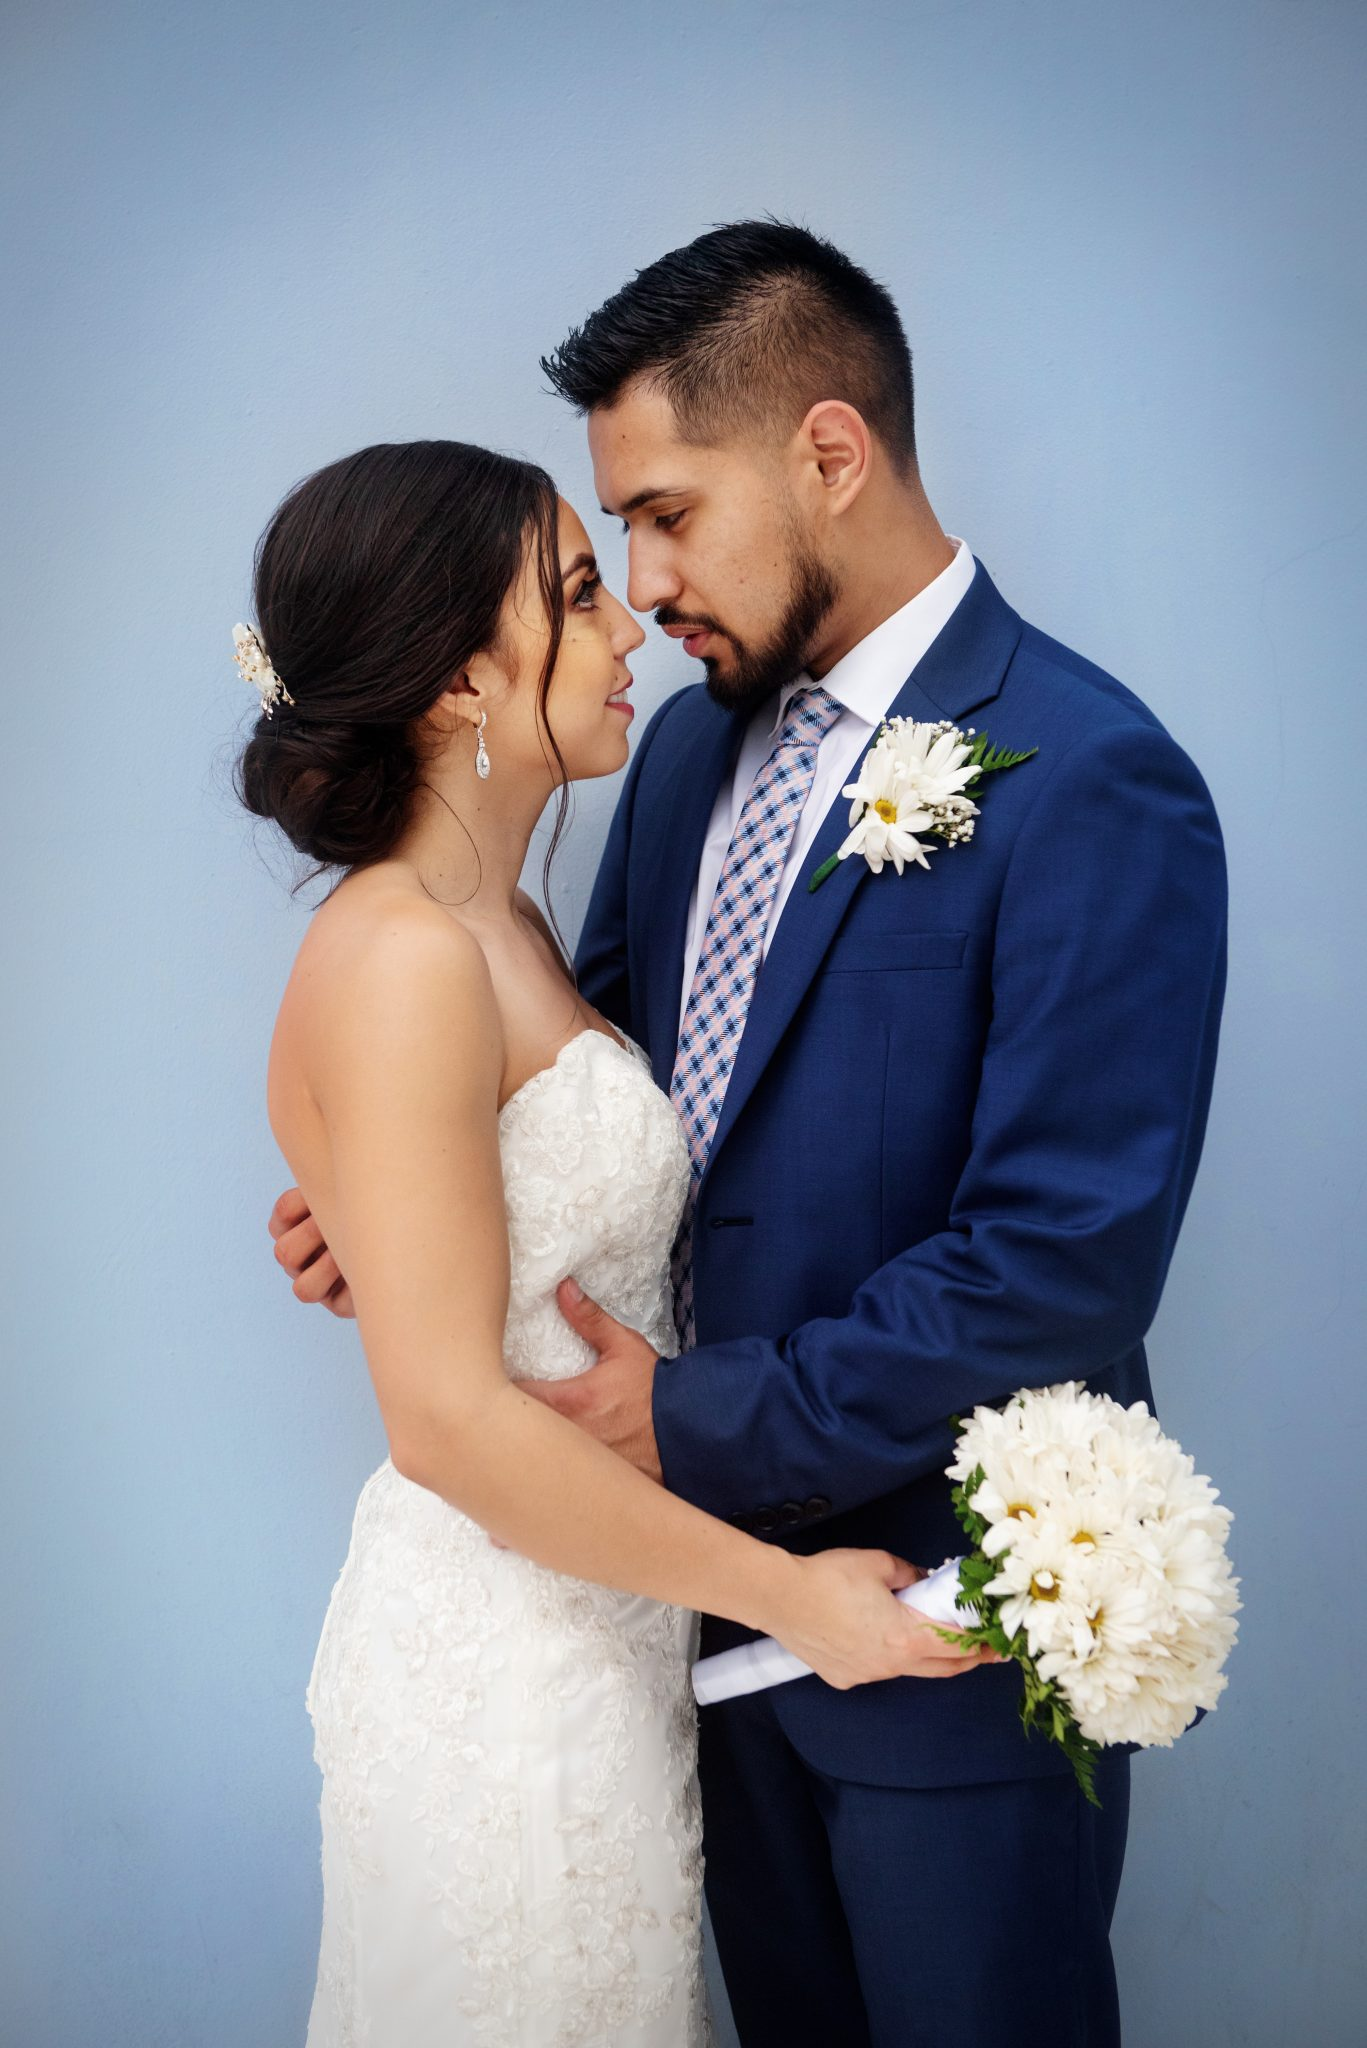 Best Greek Wedding DJ